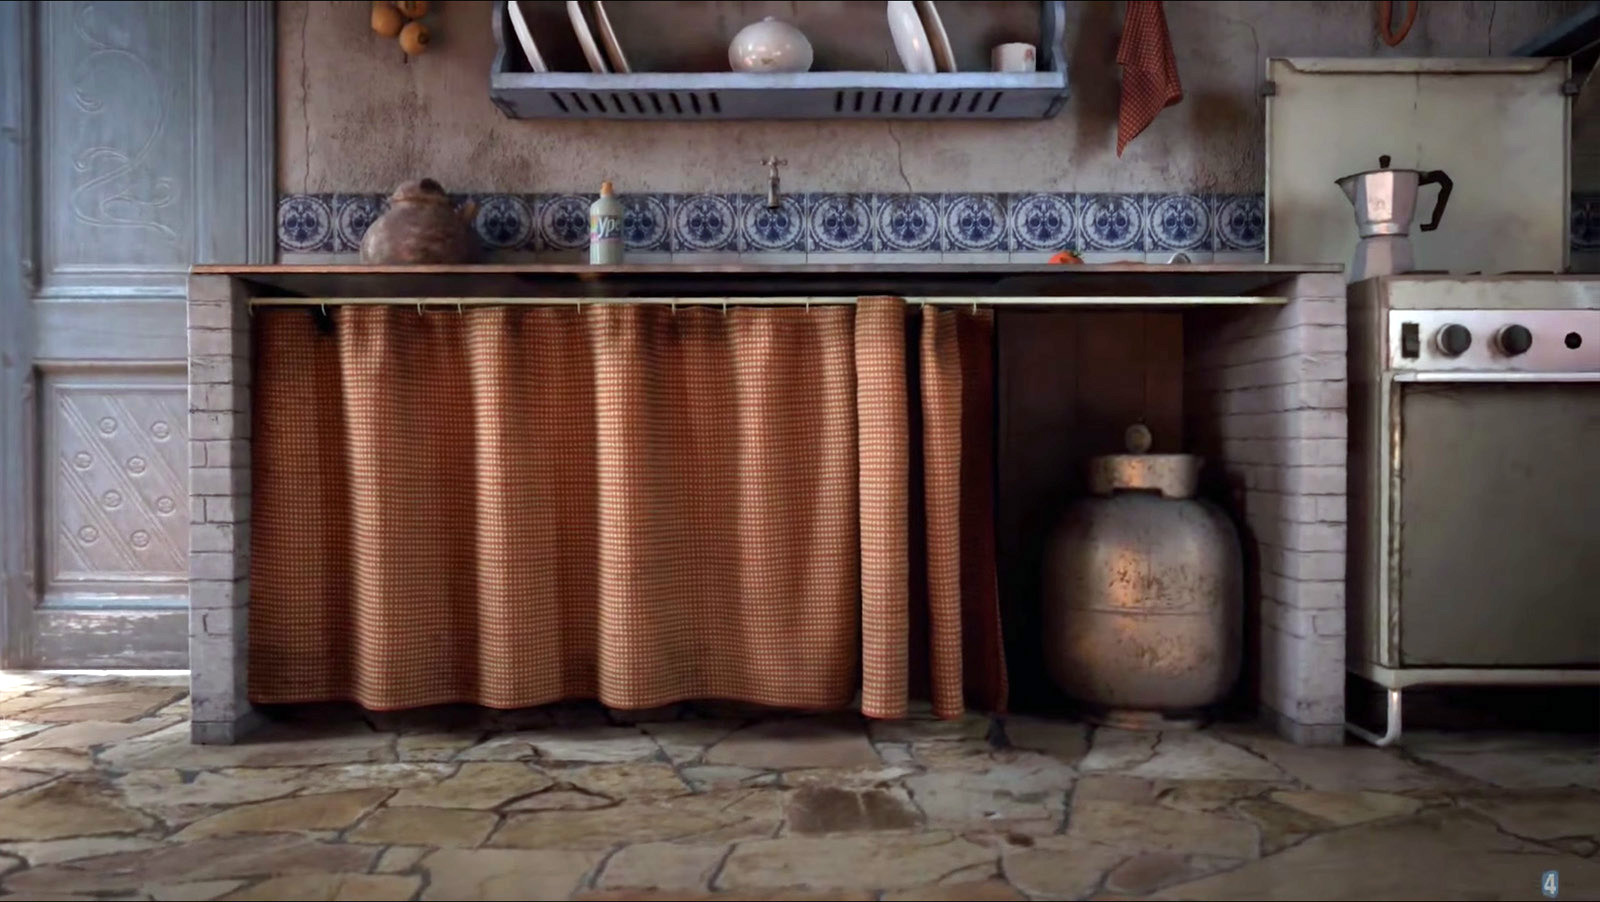 VWArtclub - Old Brazilian Kitchen